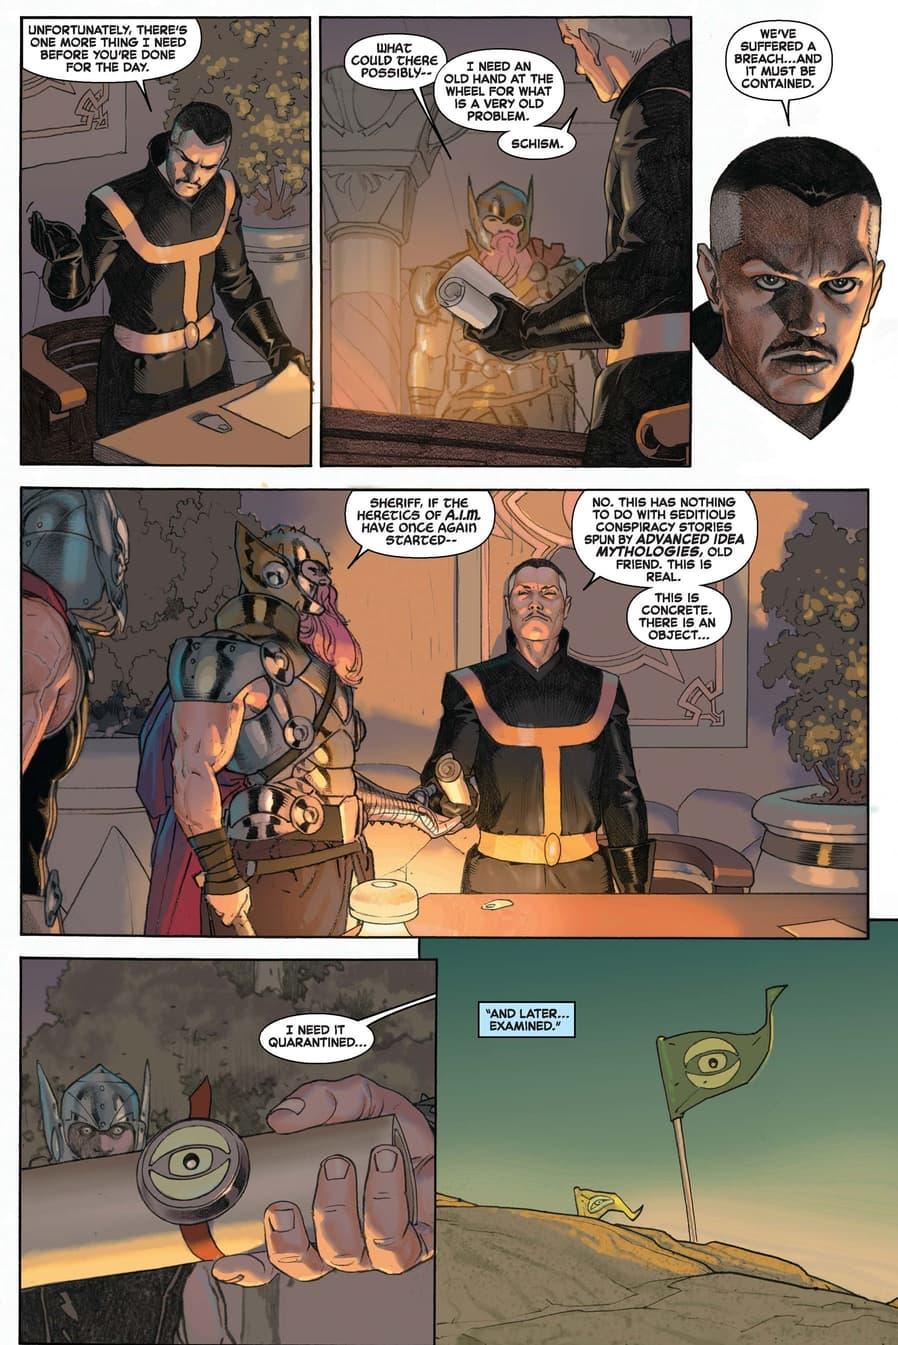 Sheriff Strange gives the orders in SECRET WARS (2015) #2.